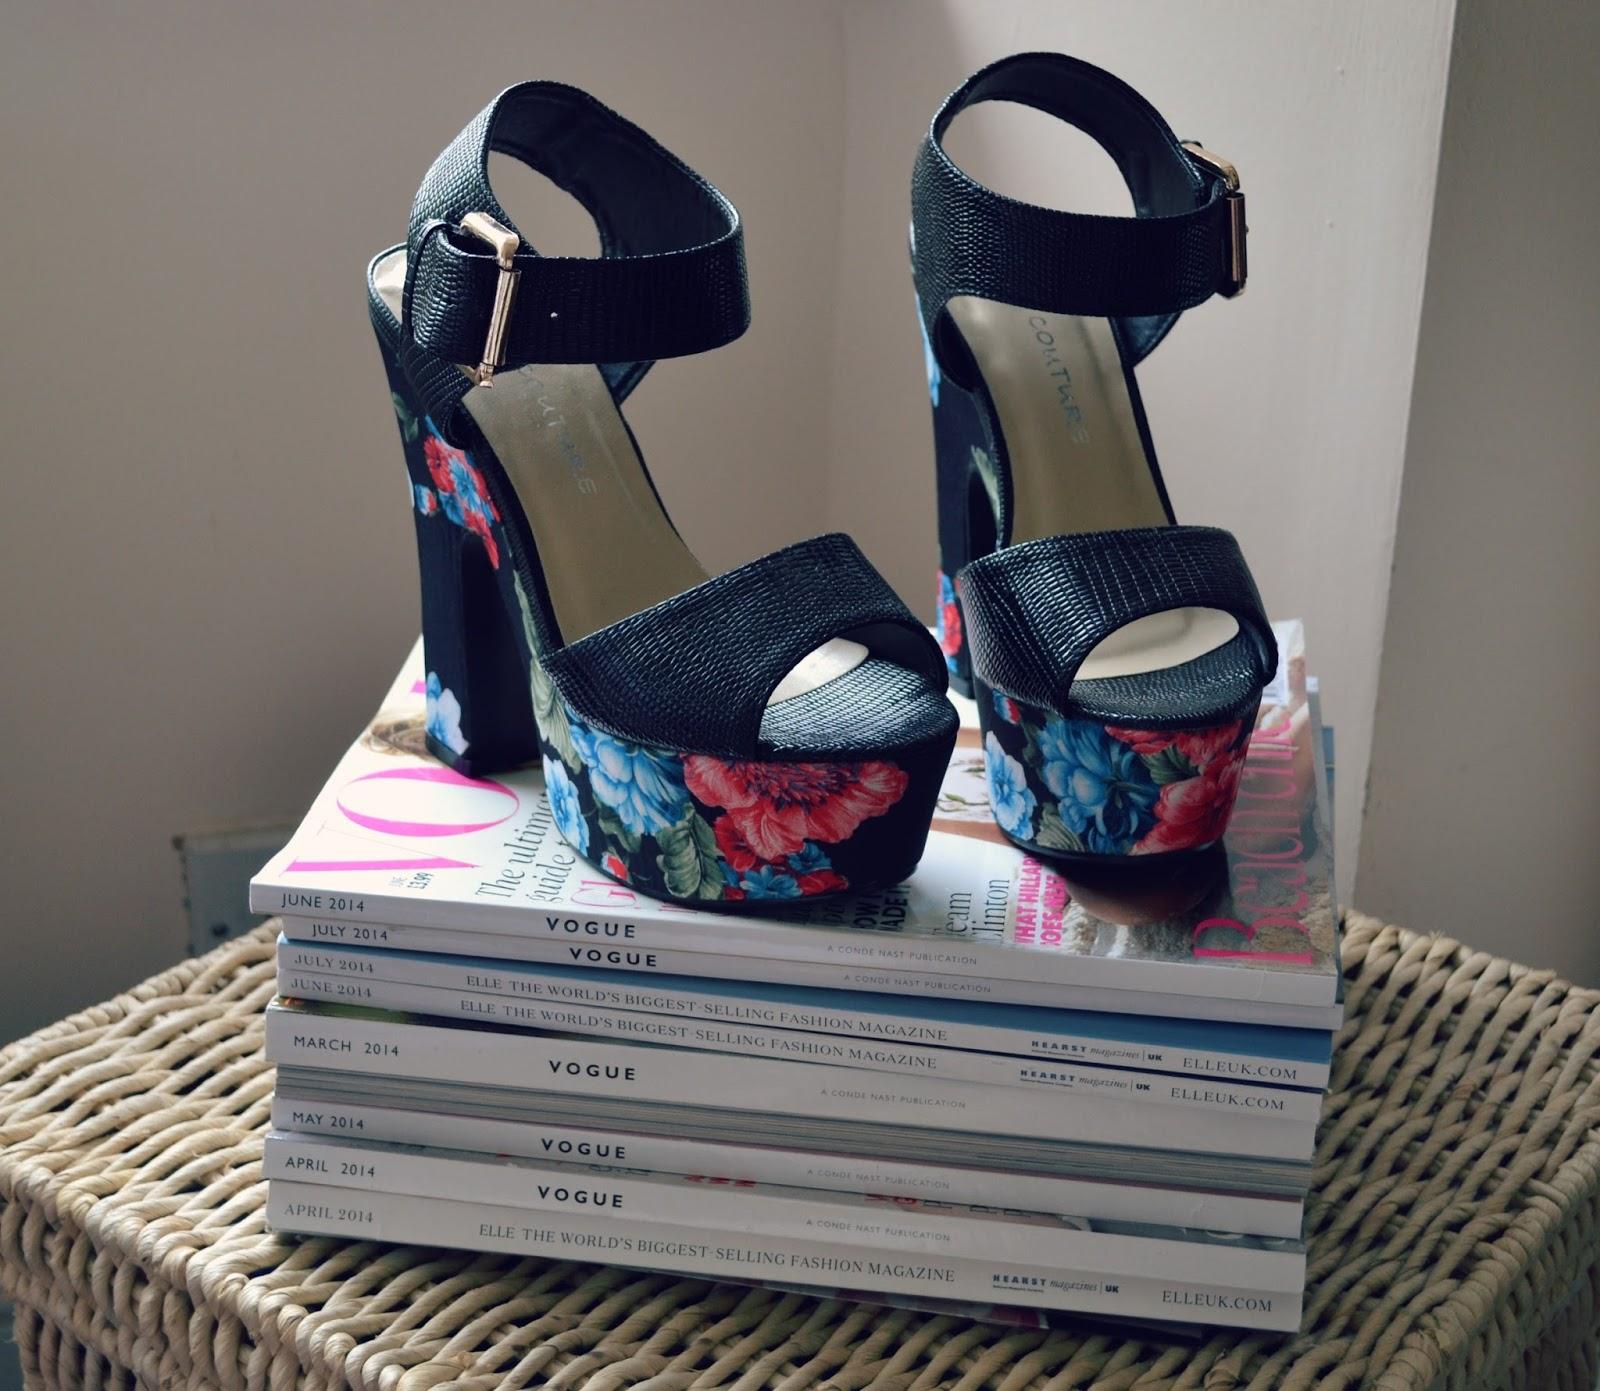 quiz tropical floral platform sandal heels shoes